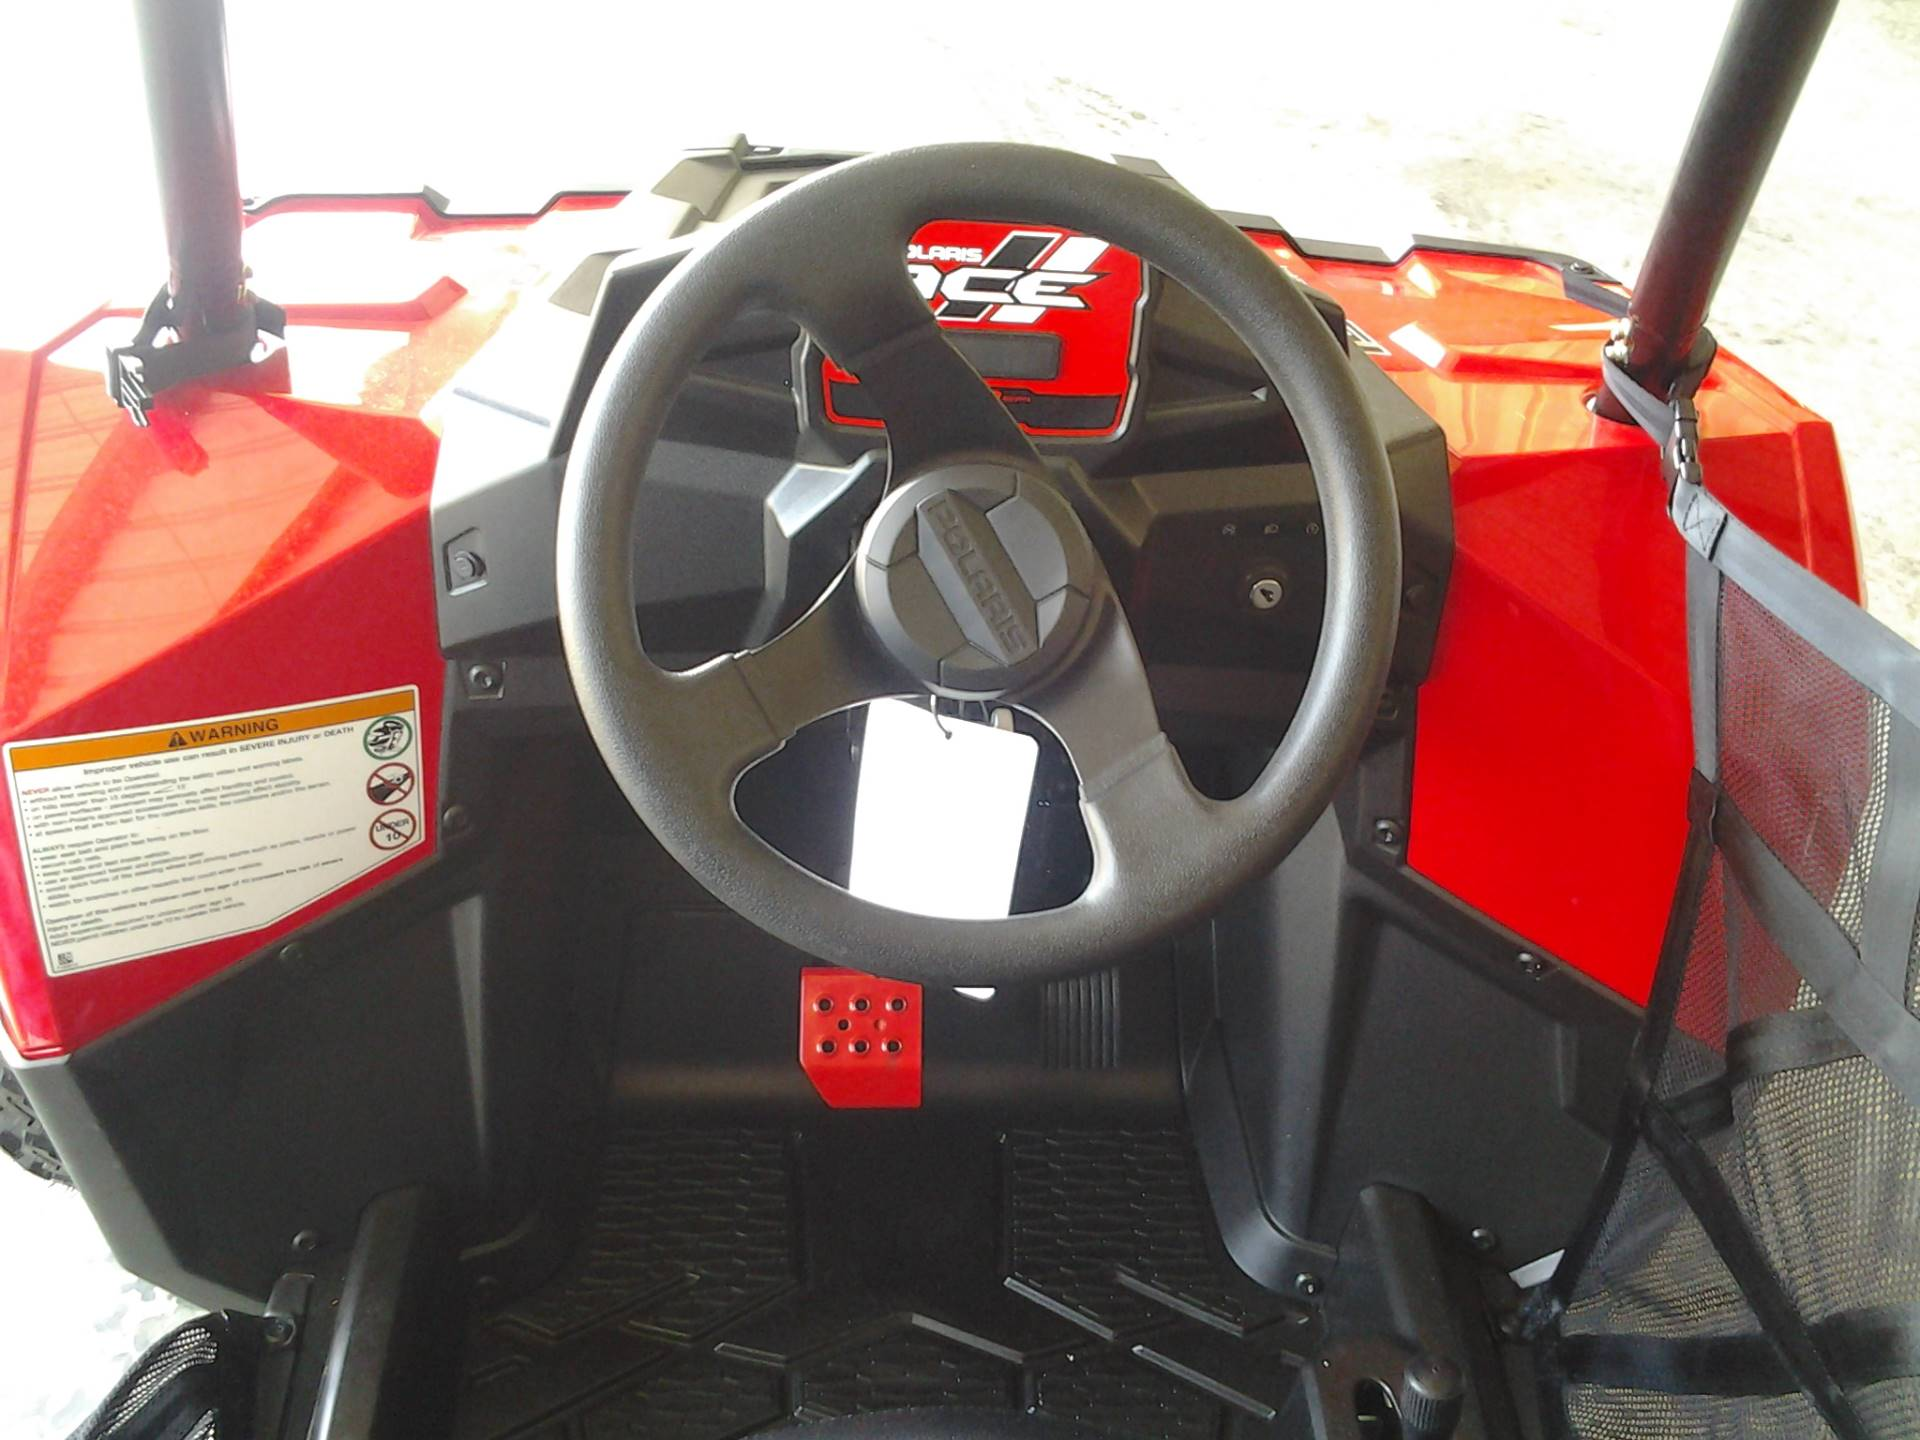 2017 Polaris Ace 150 EFI 10